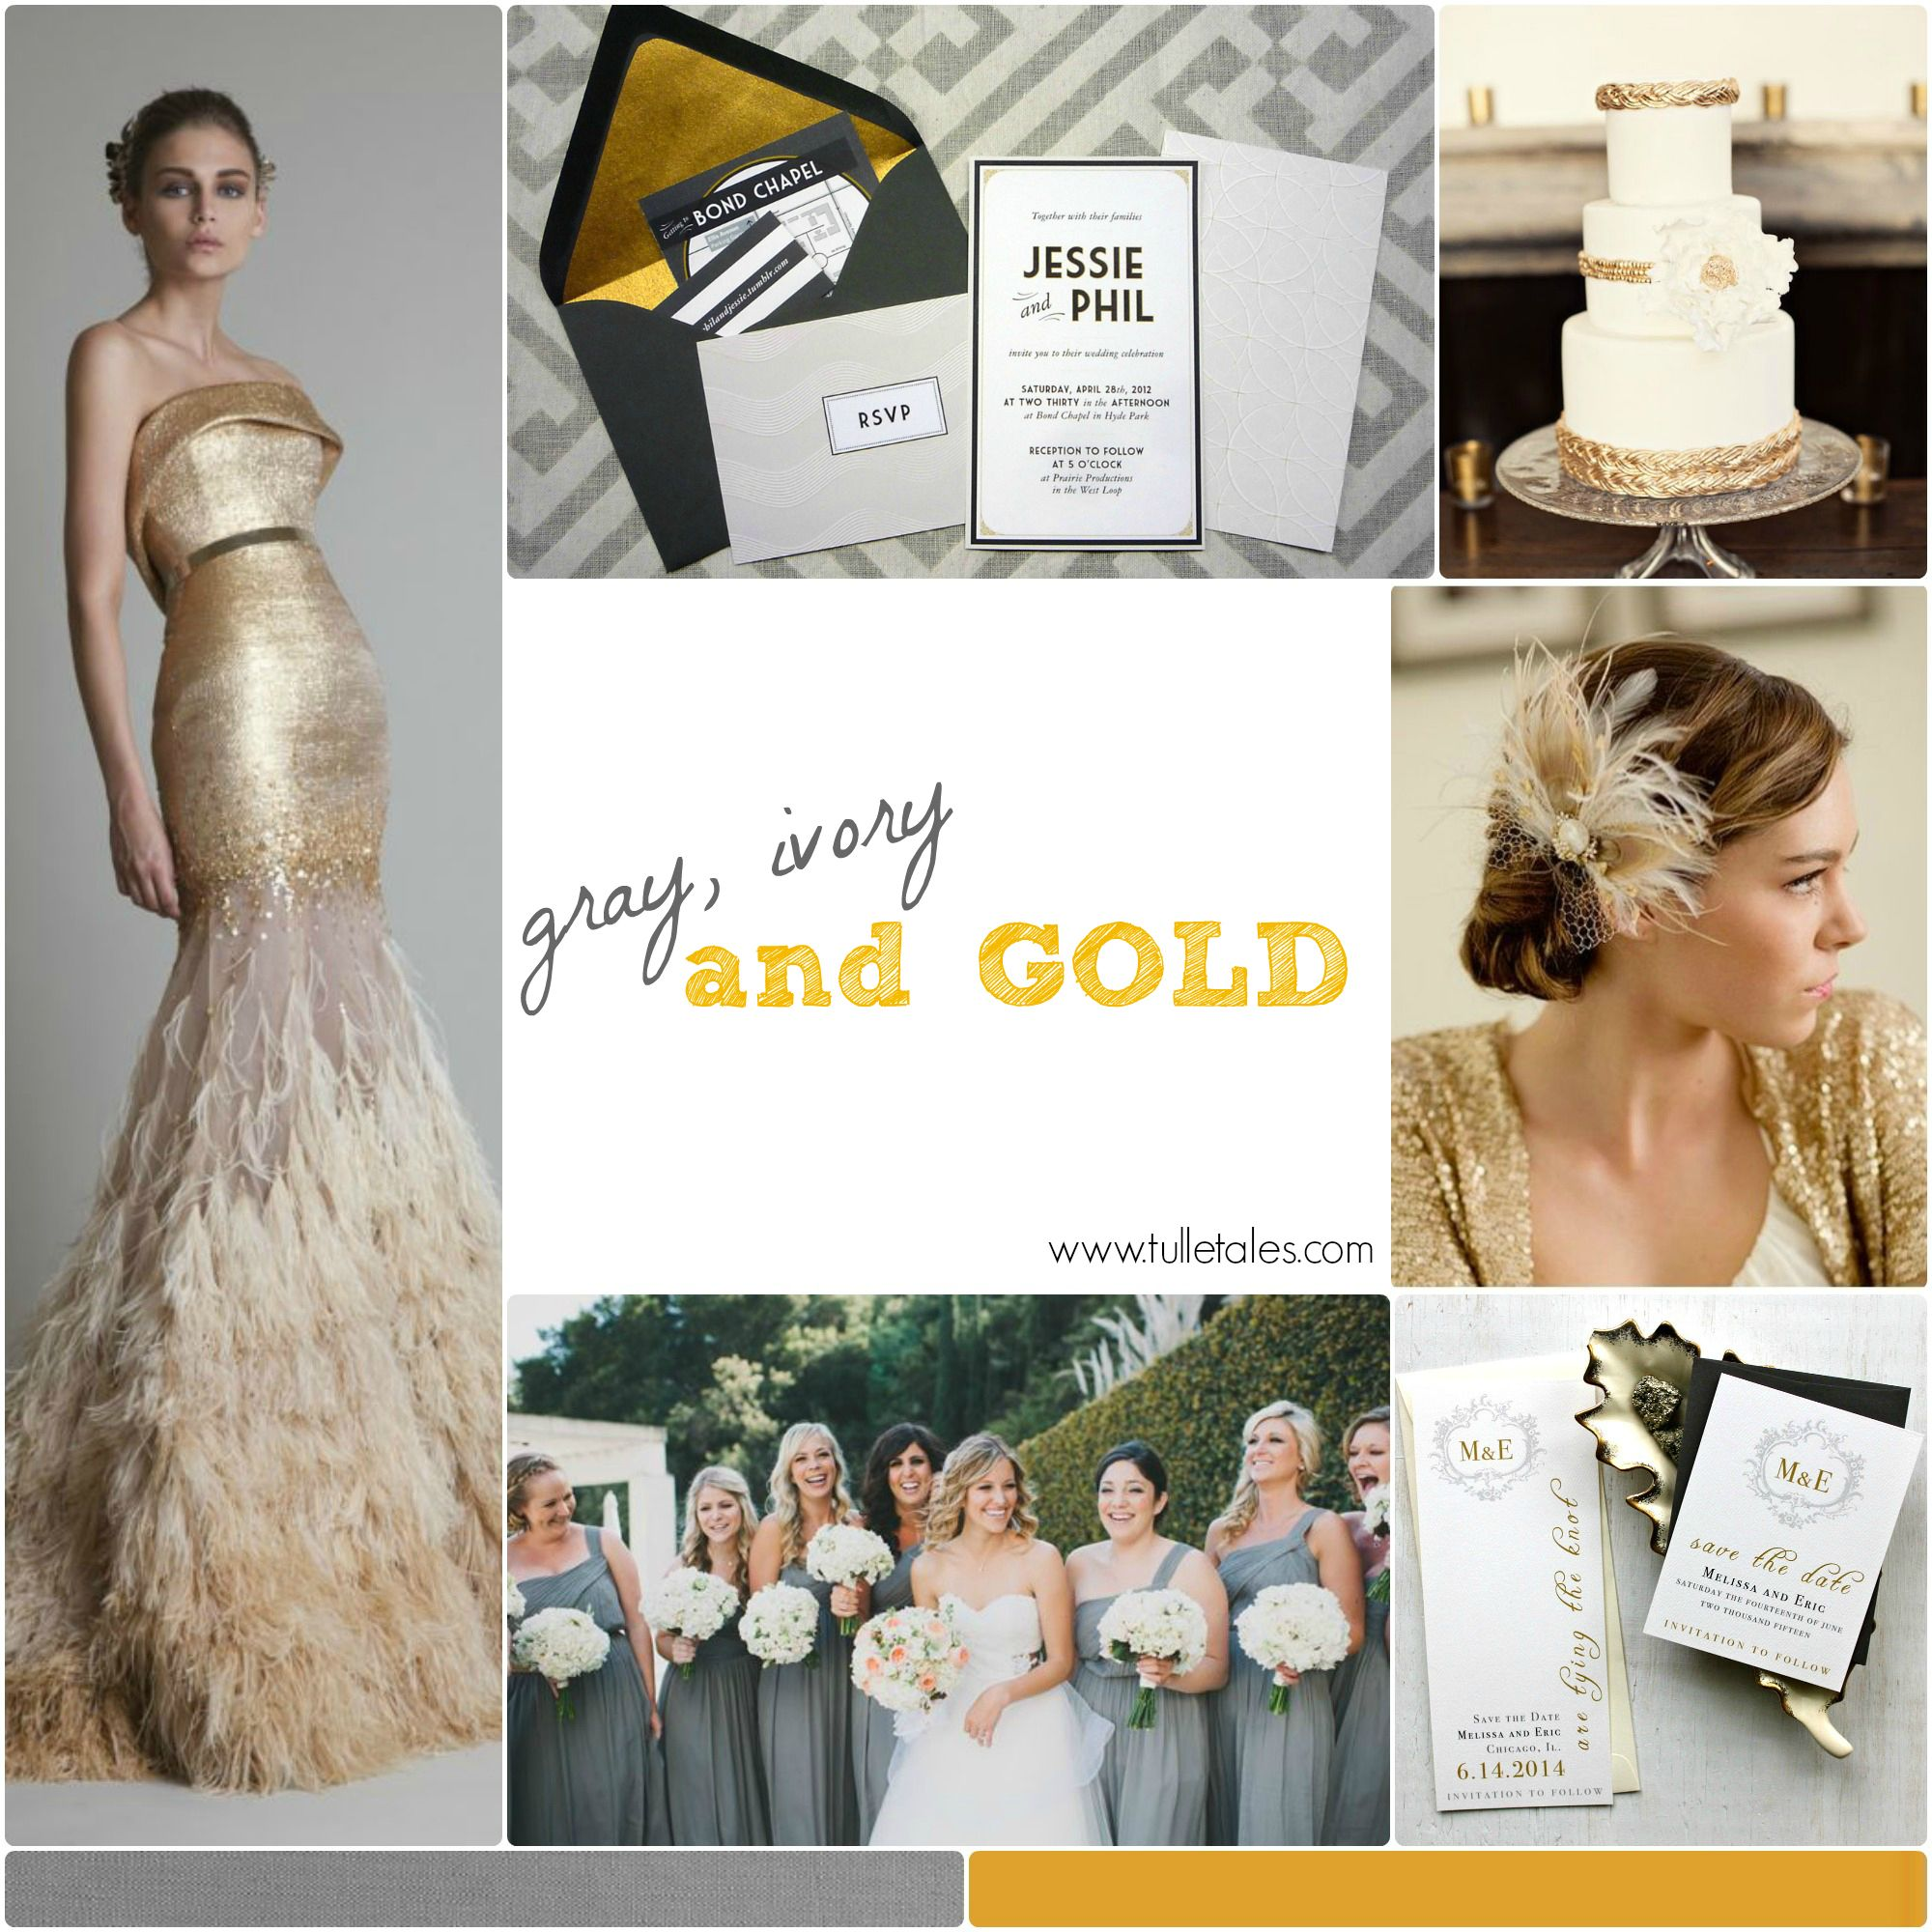 Gray, Ivory and Gold Wedding | Wedding Stuff! | Pinterest | Ivory ...